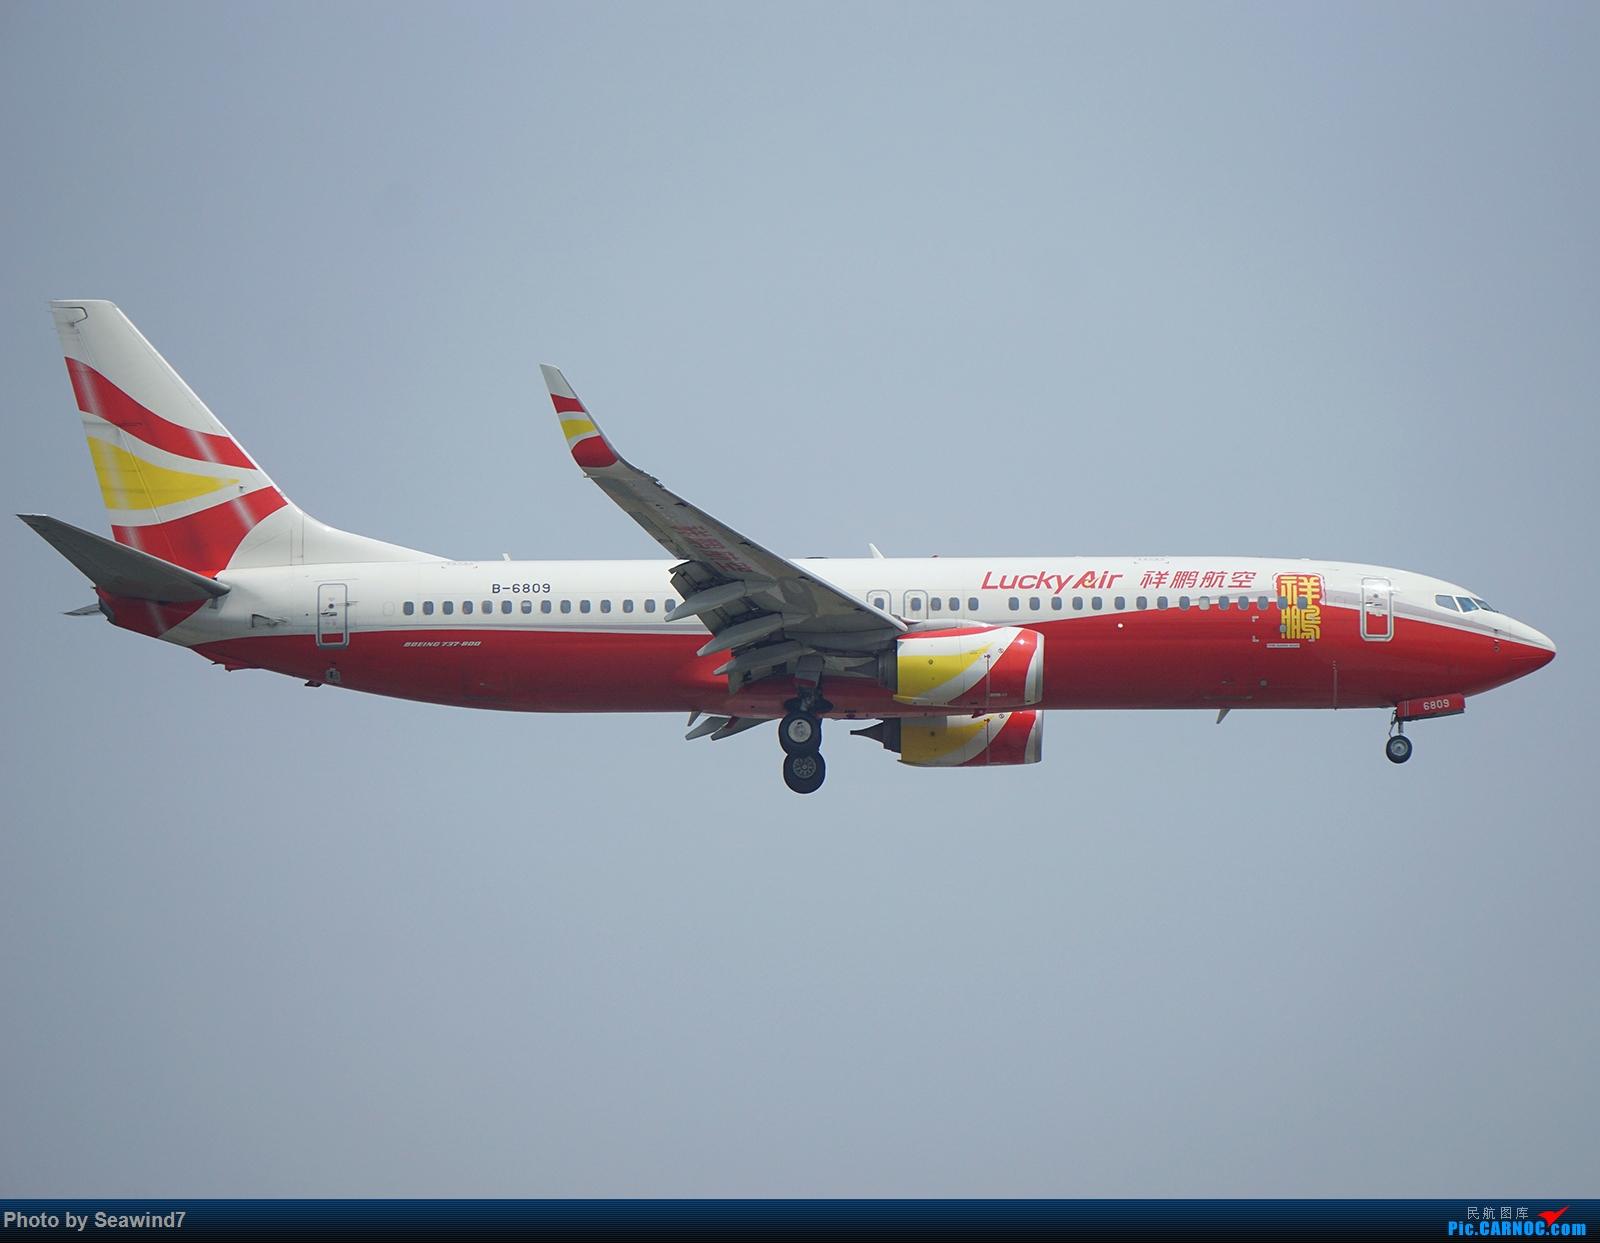 Re:[原创]新手的五一假期(含玩具总动员) BOEING 737-800 B-6809 中国上海虹桥国际机场